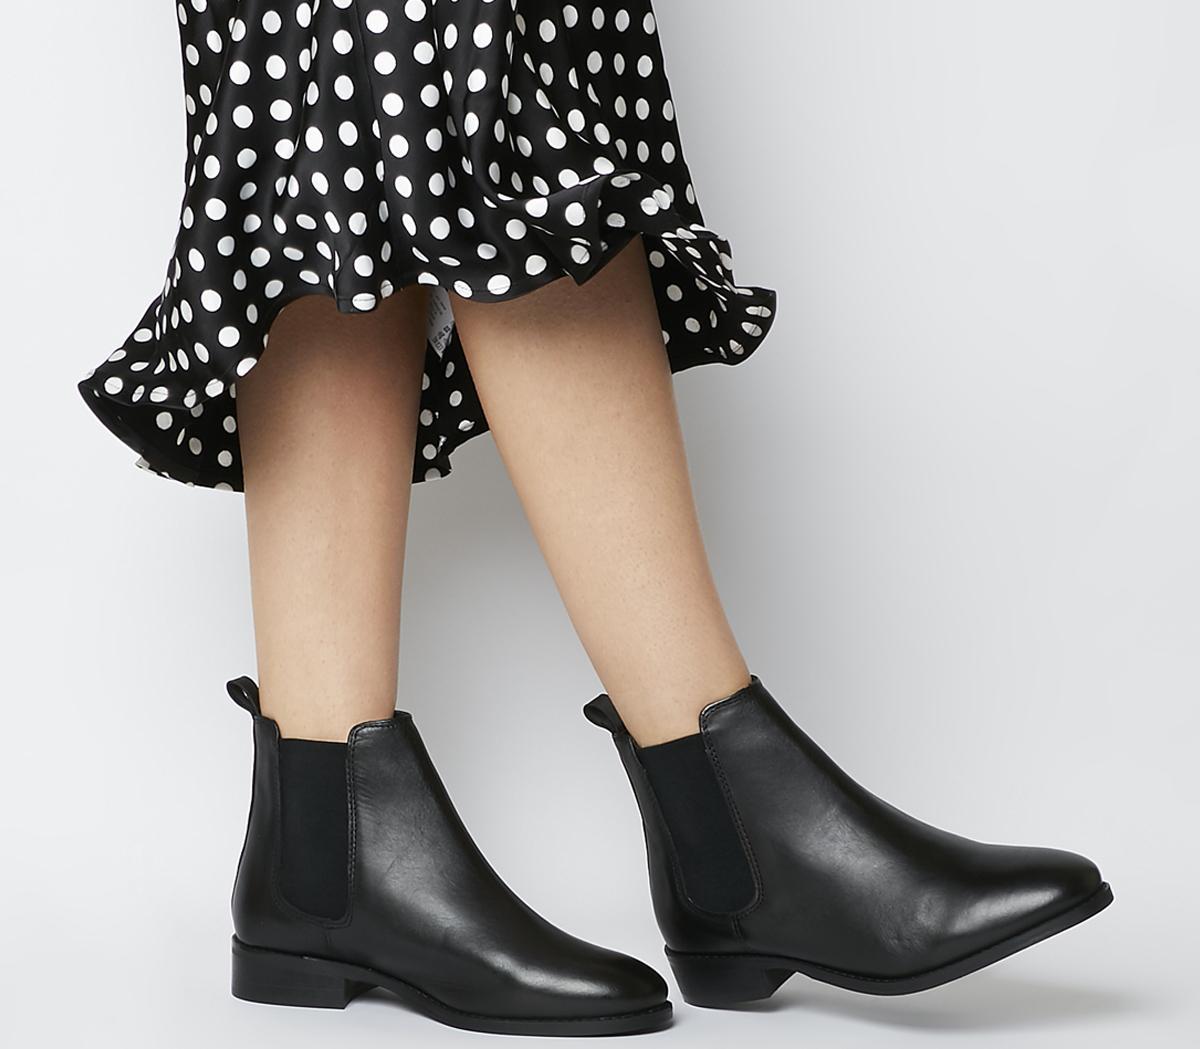 Bramble Wf Chelsea Boots